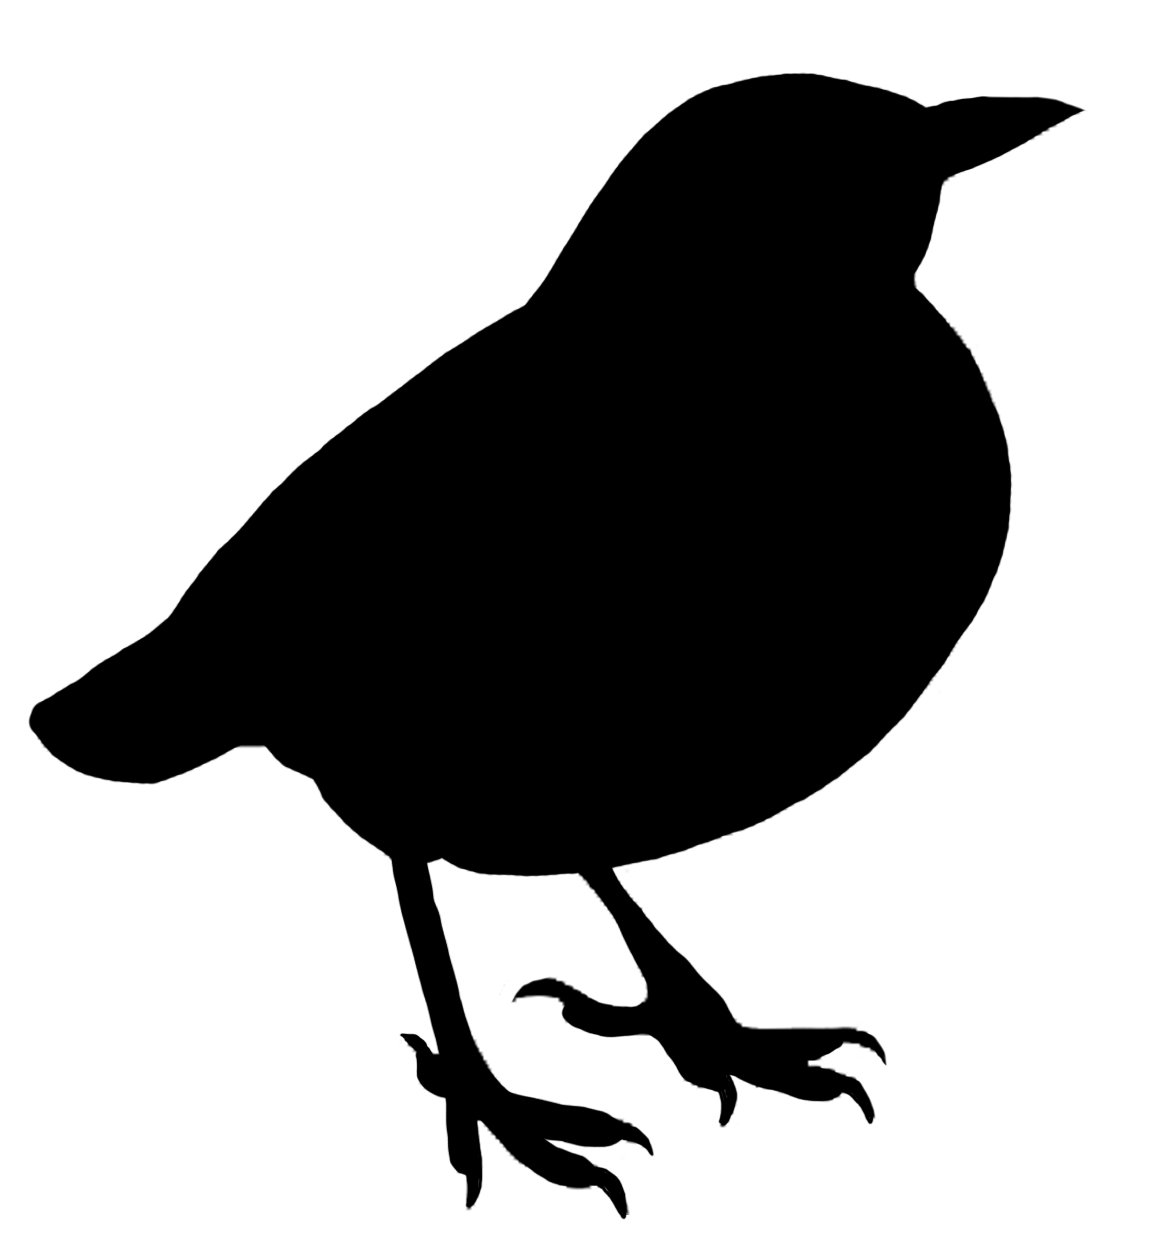 1156x1256 Bird Silhouette Transparent Png